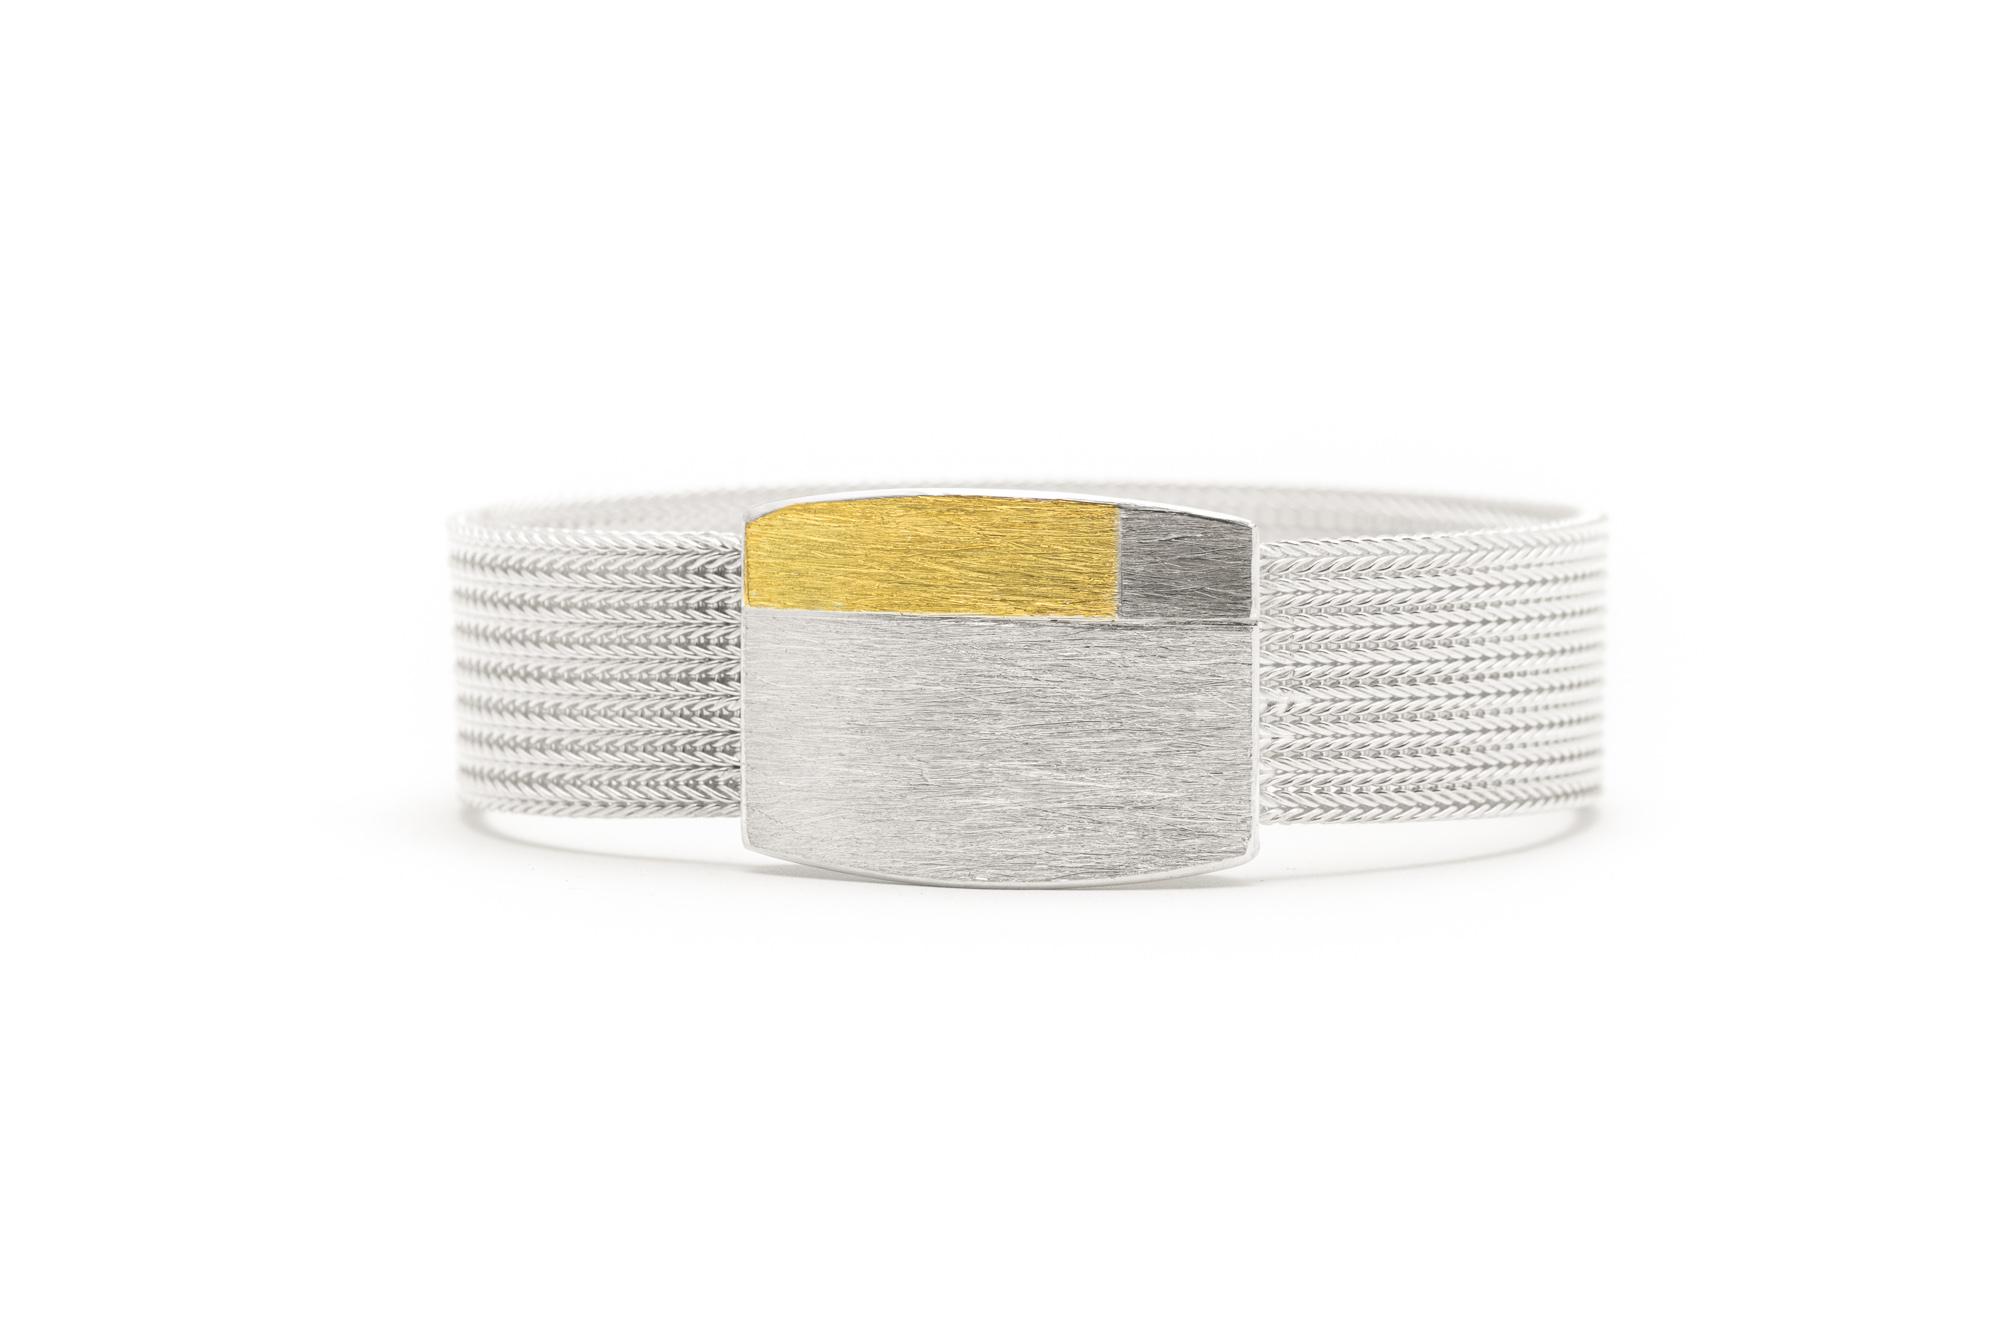 Armband, Silber, Feingold, Palladium 620€